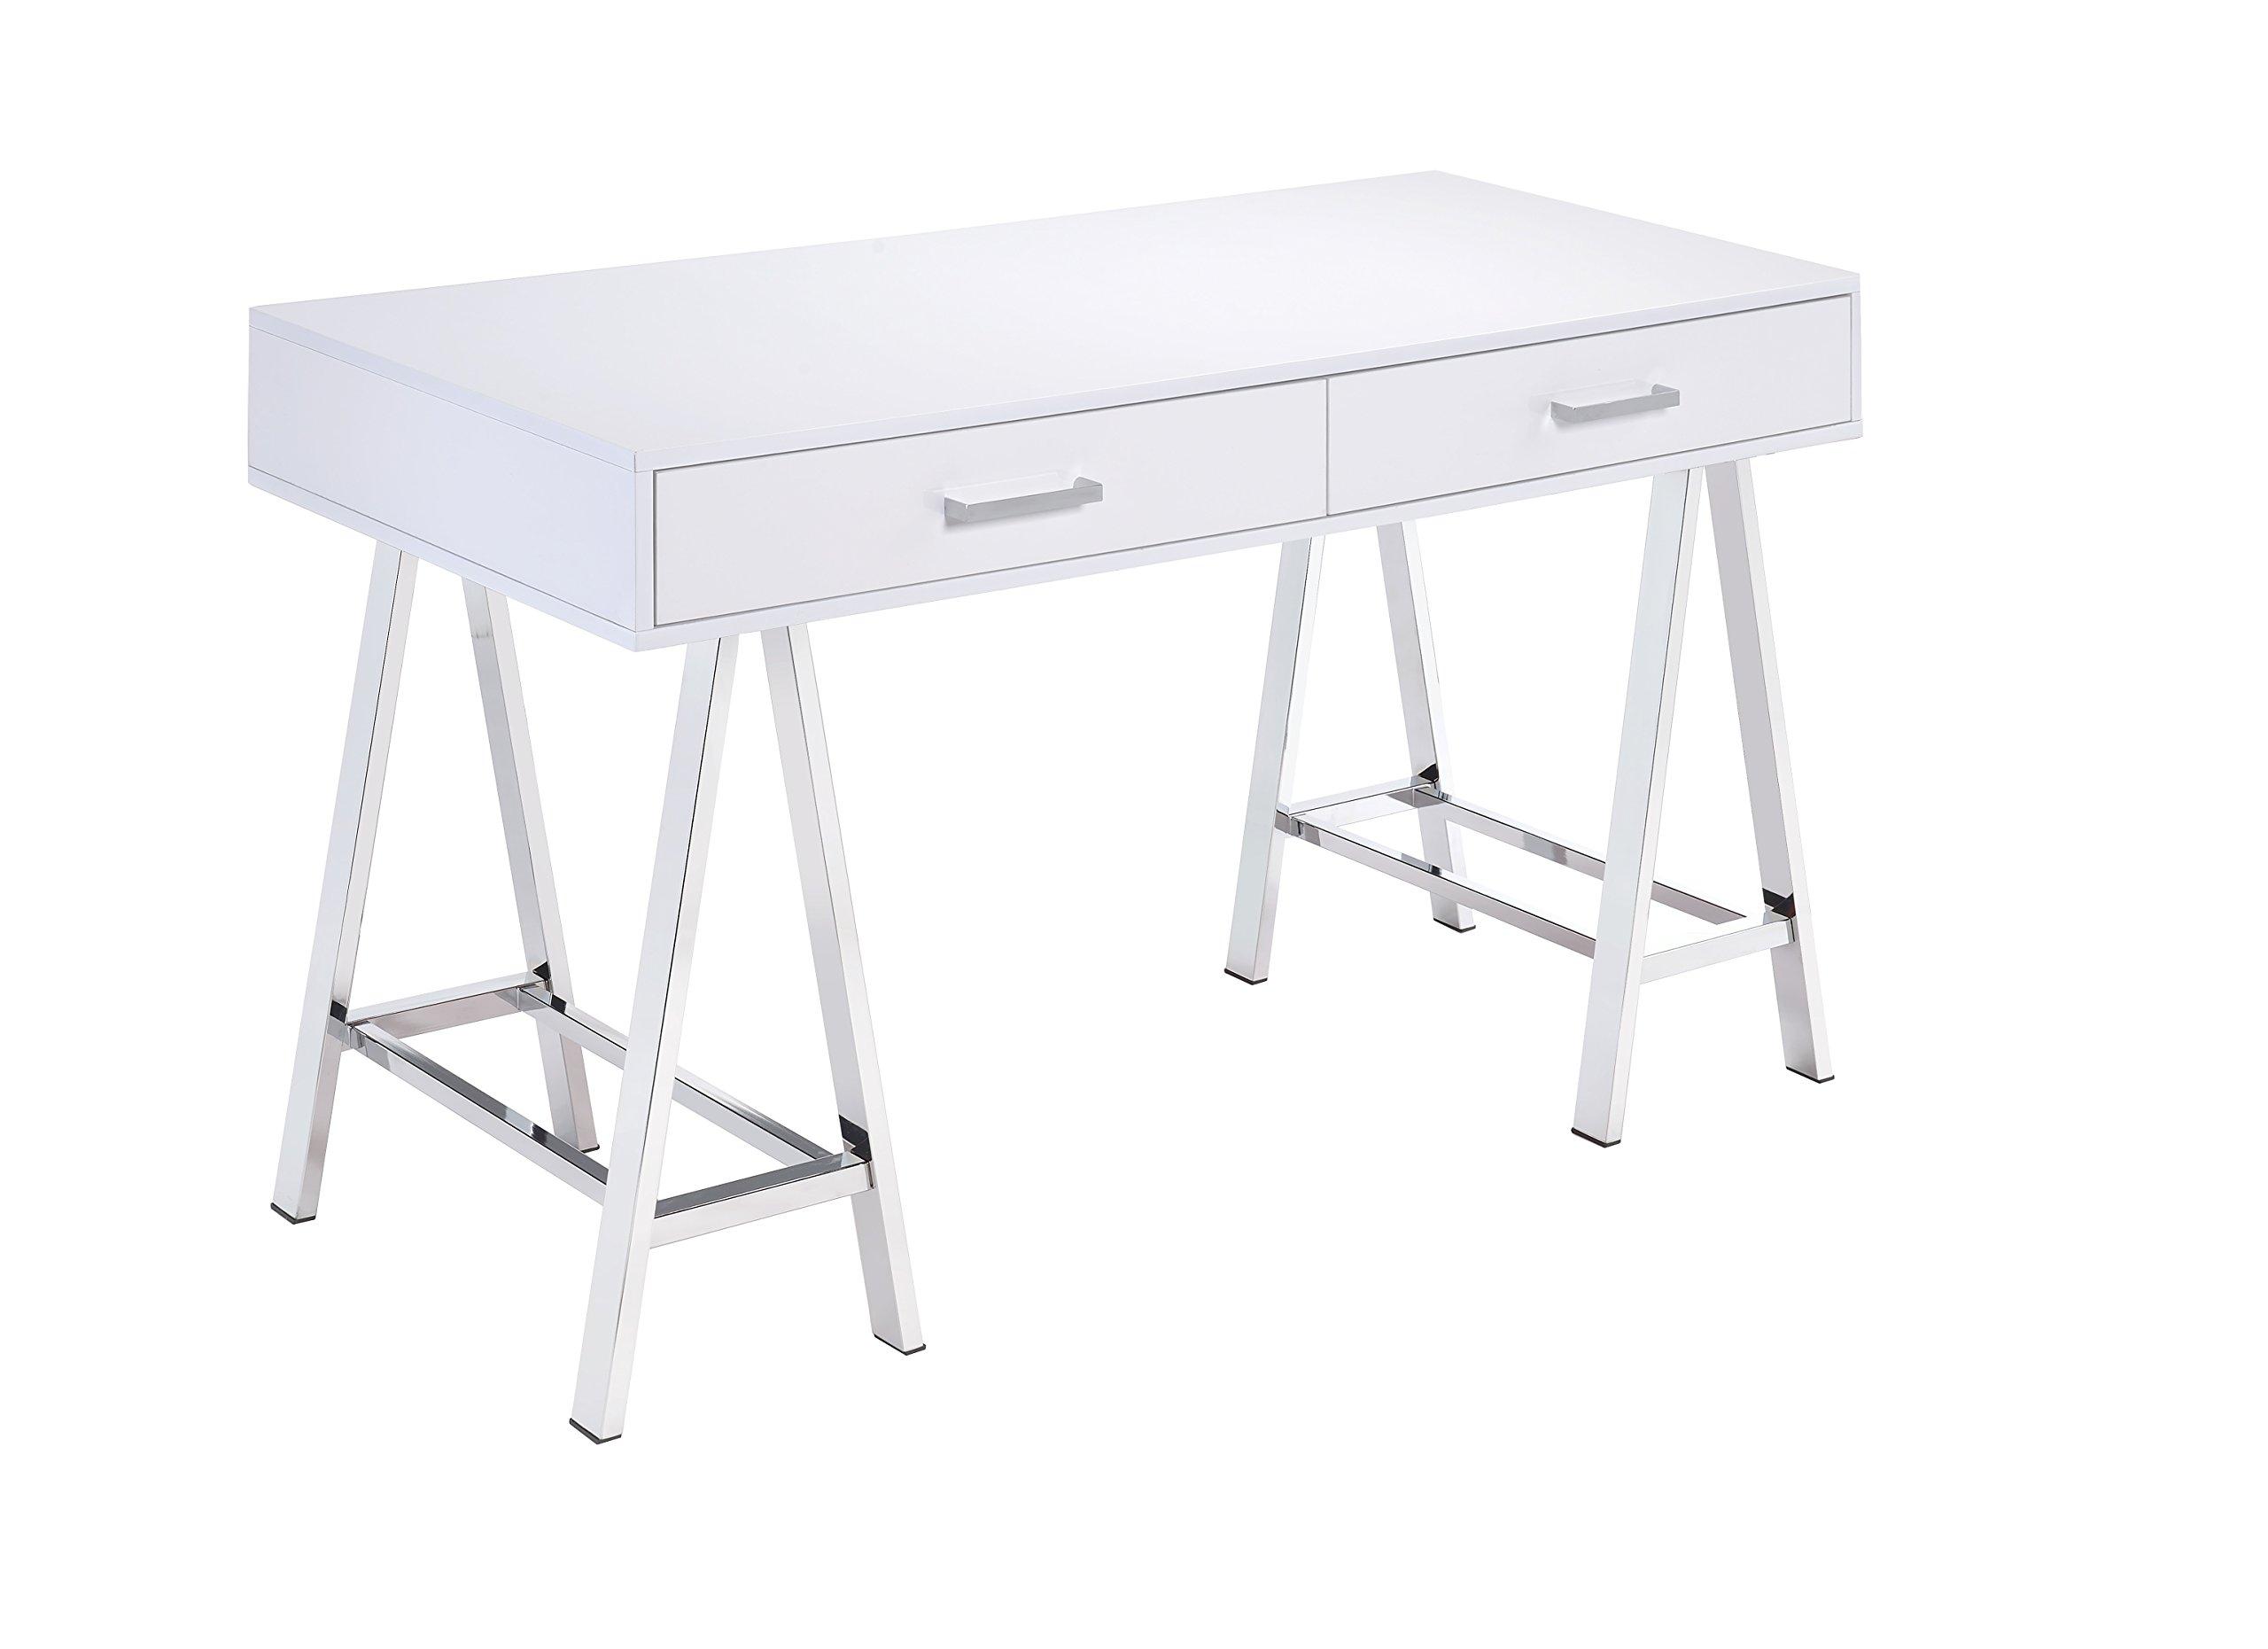 ACME Furniture Acme 92229 Coleen Desk, White & Chrome, One Size